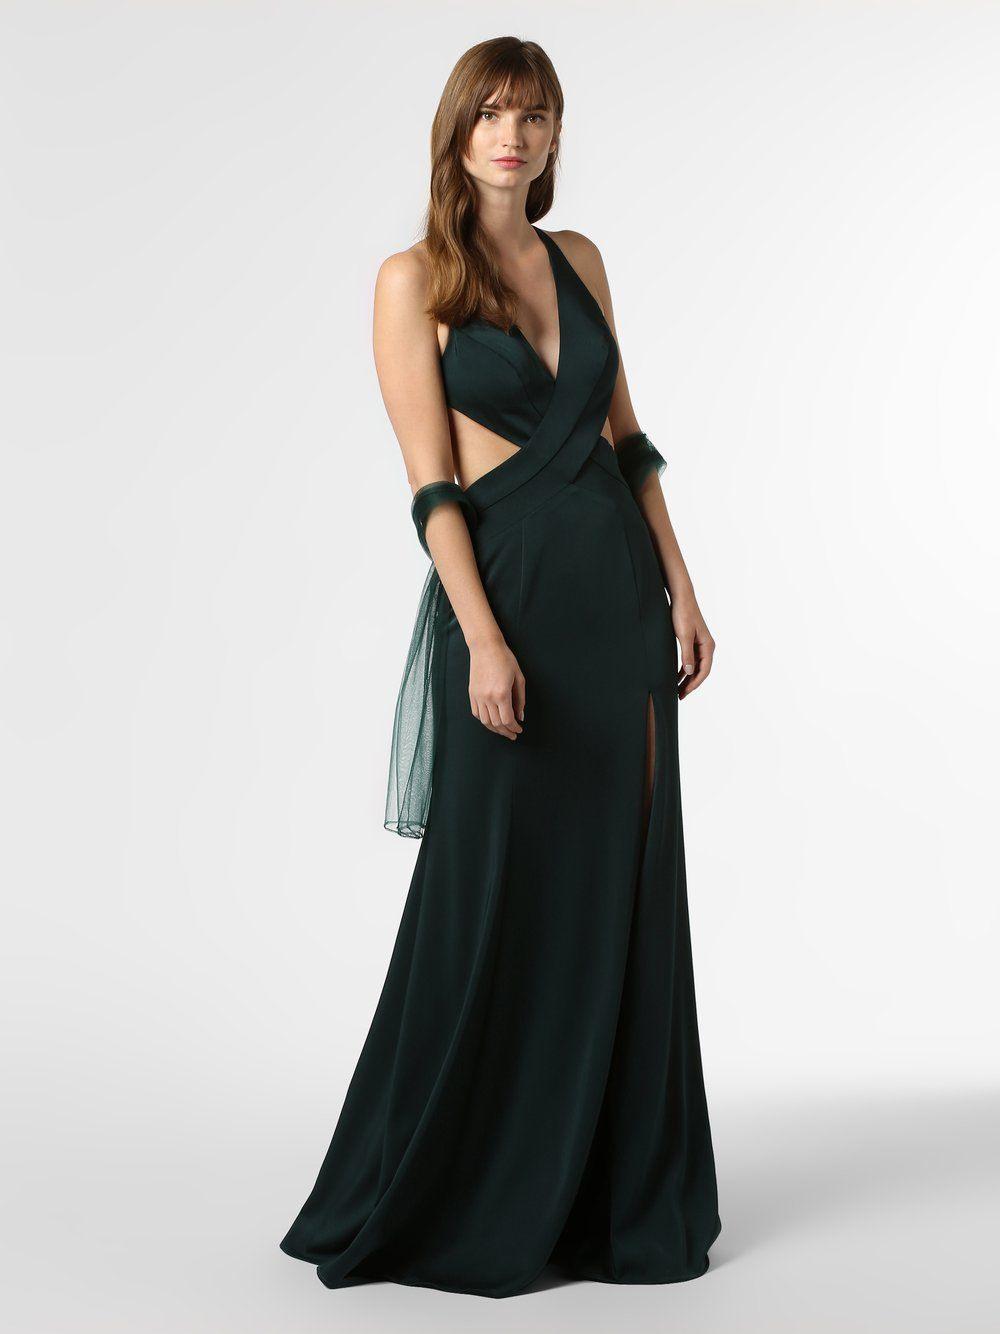 Designer Luxurius Abendkleid Mascara Vertrieb17 Coolste Abendkleid Mascara Spezialgebiet